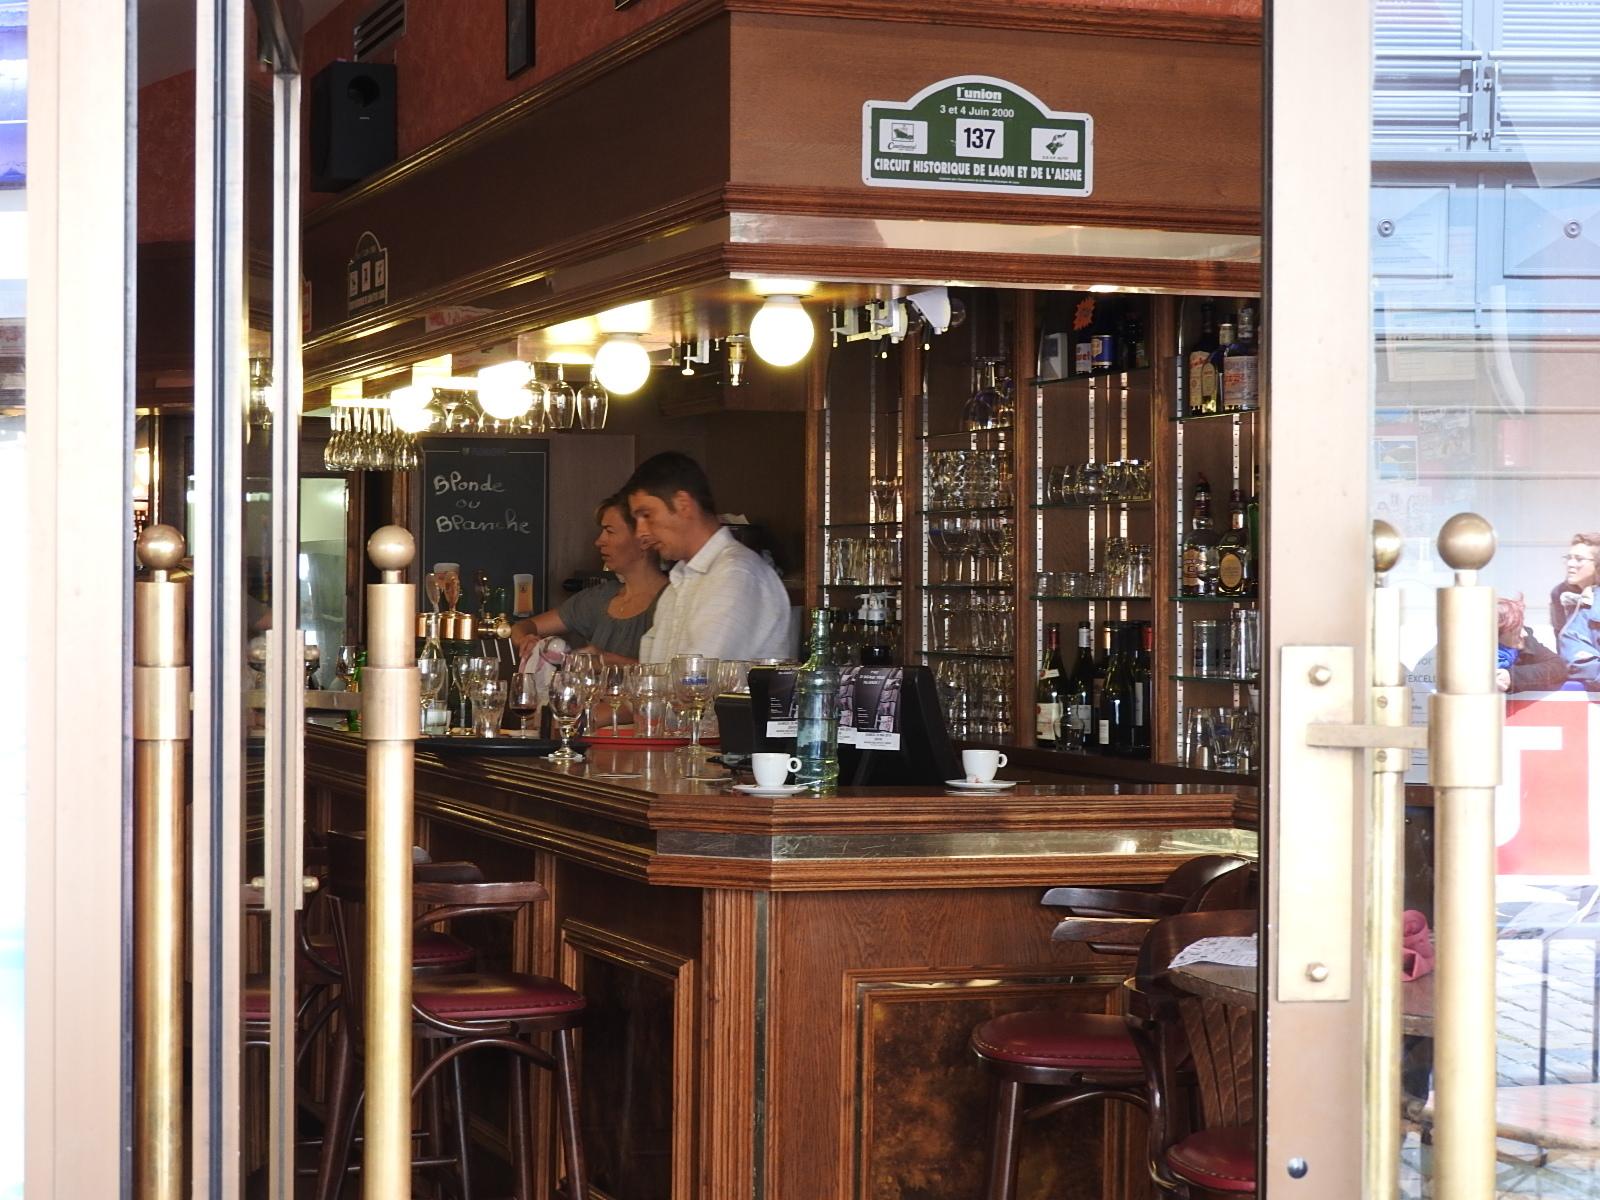 Typical bar